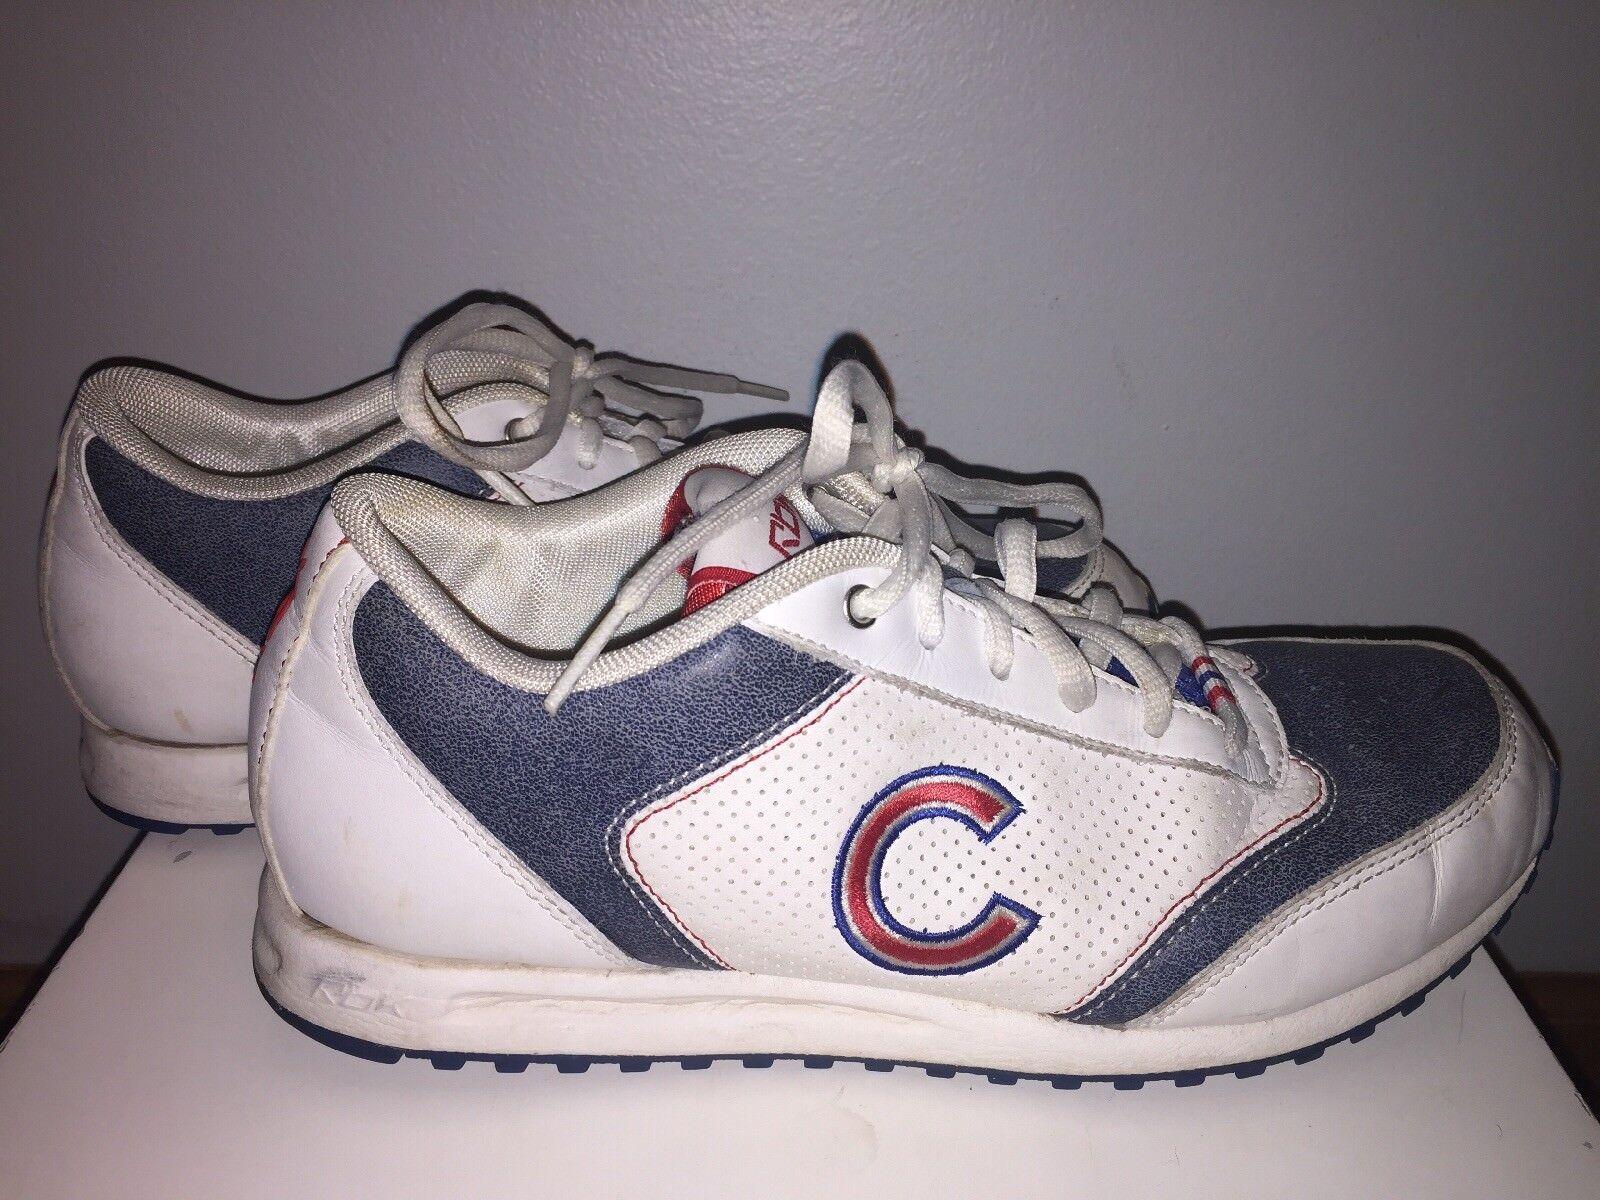 CHICAGO CUBS FAN SHOES SZ 8 Vintage REEBOK CLASSIC WHITE Authentic Collection